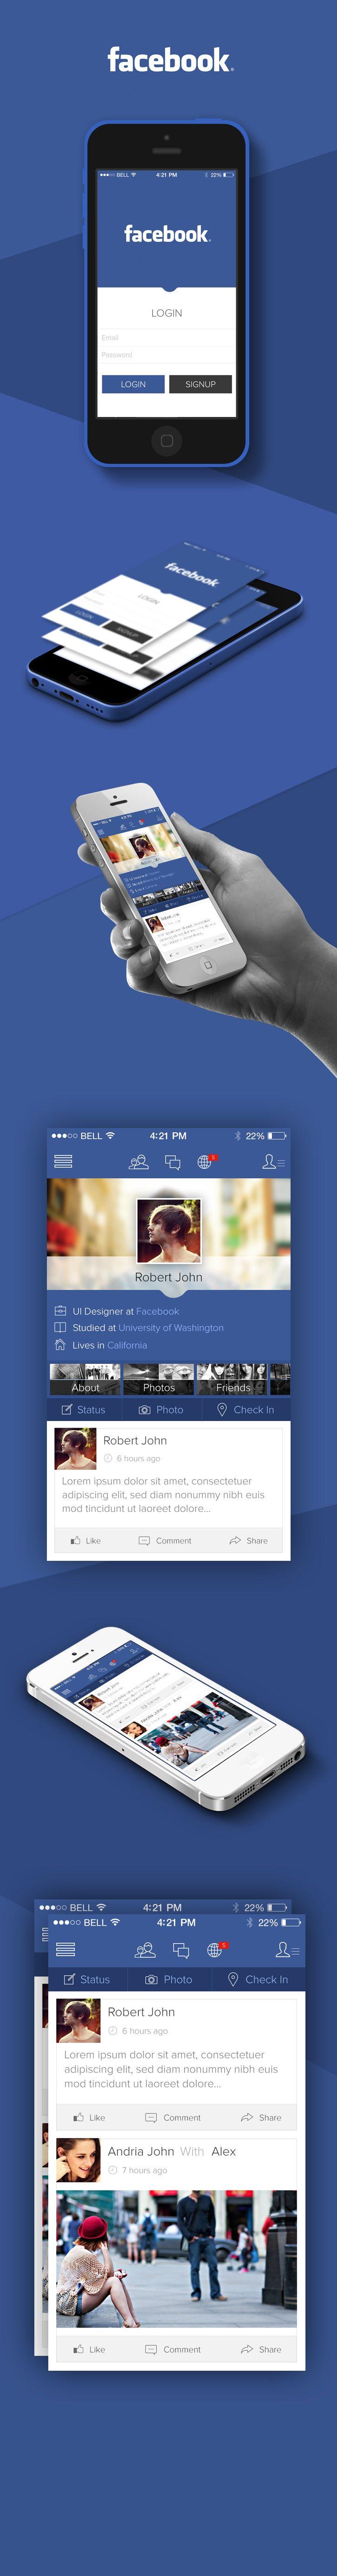 Facebook iOS7 Redesign via @Behance - http://www.behance.net/gallery/Facebook-iOS-7-Redesign-Concept/12073751